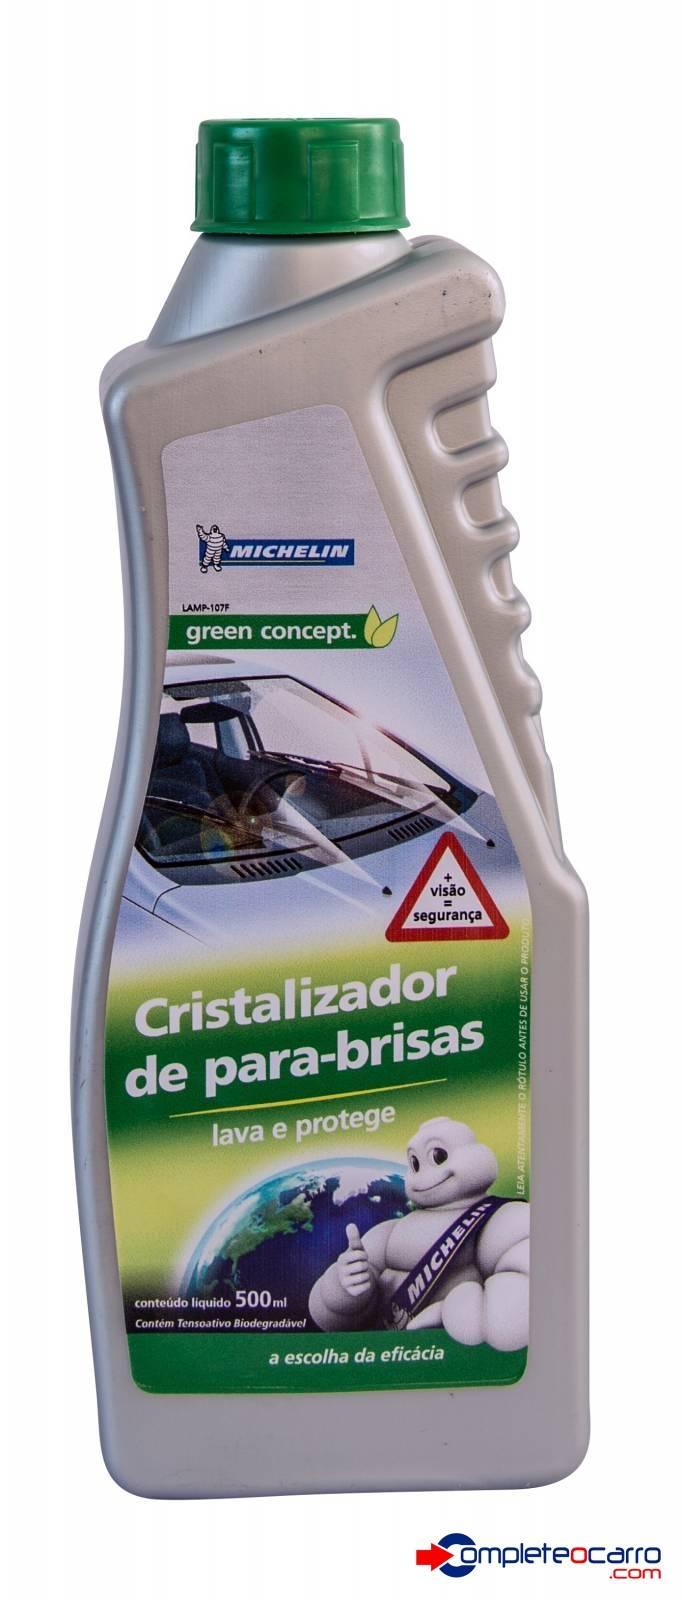 Cristalizador de Para-Brisas Michelin 500ml